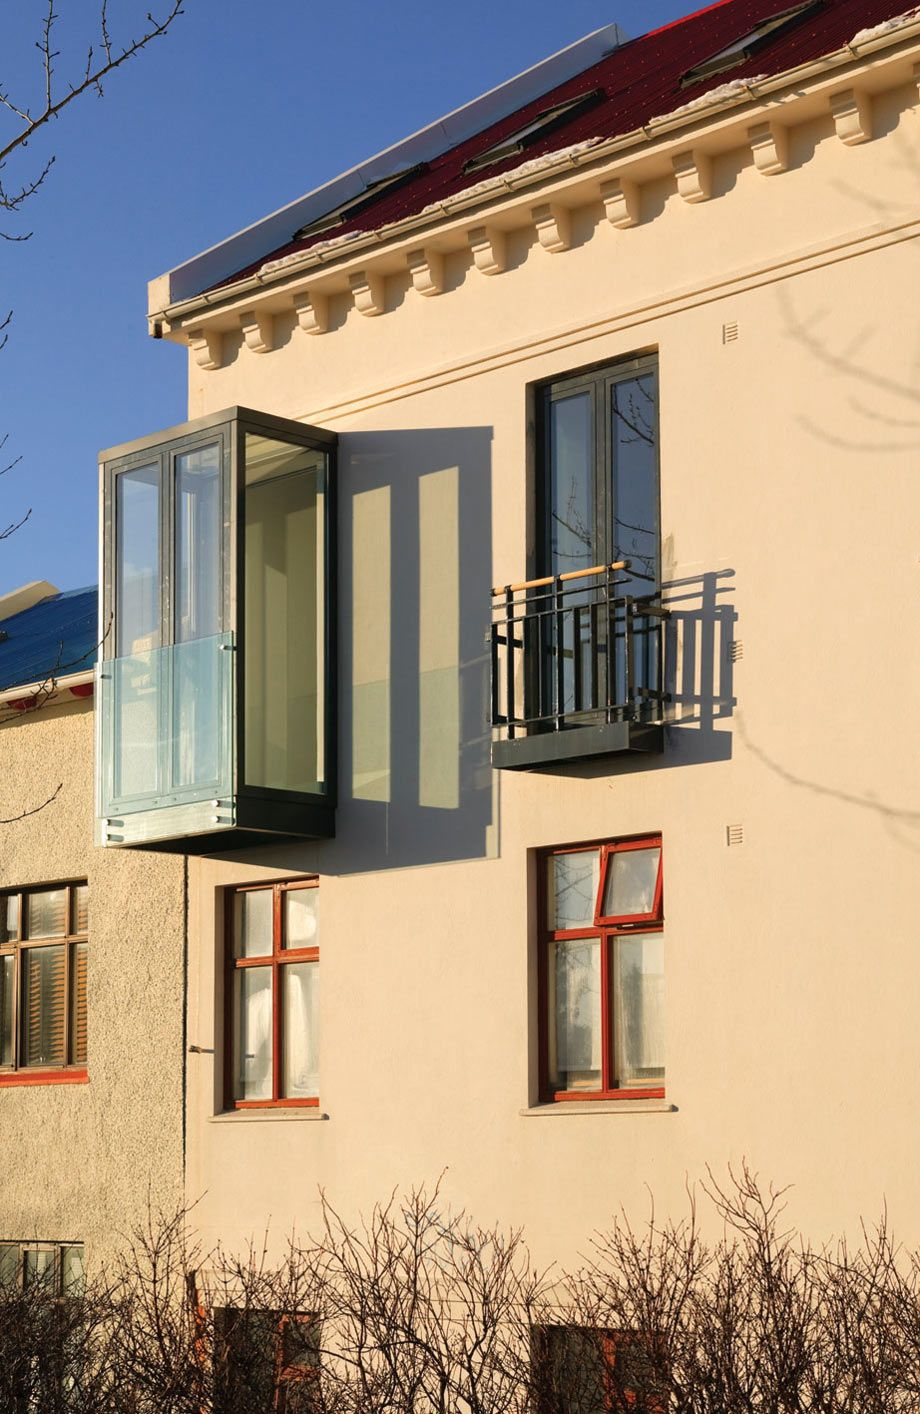 Balcony modern apartment in reykjavik iceland